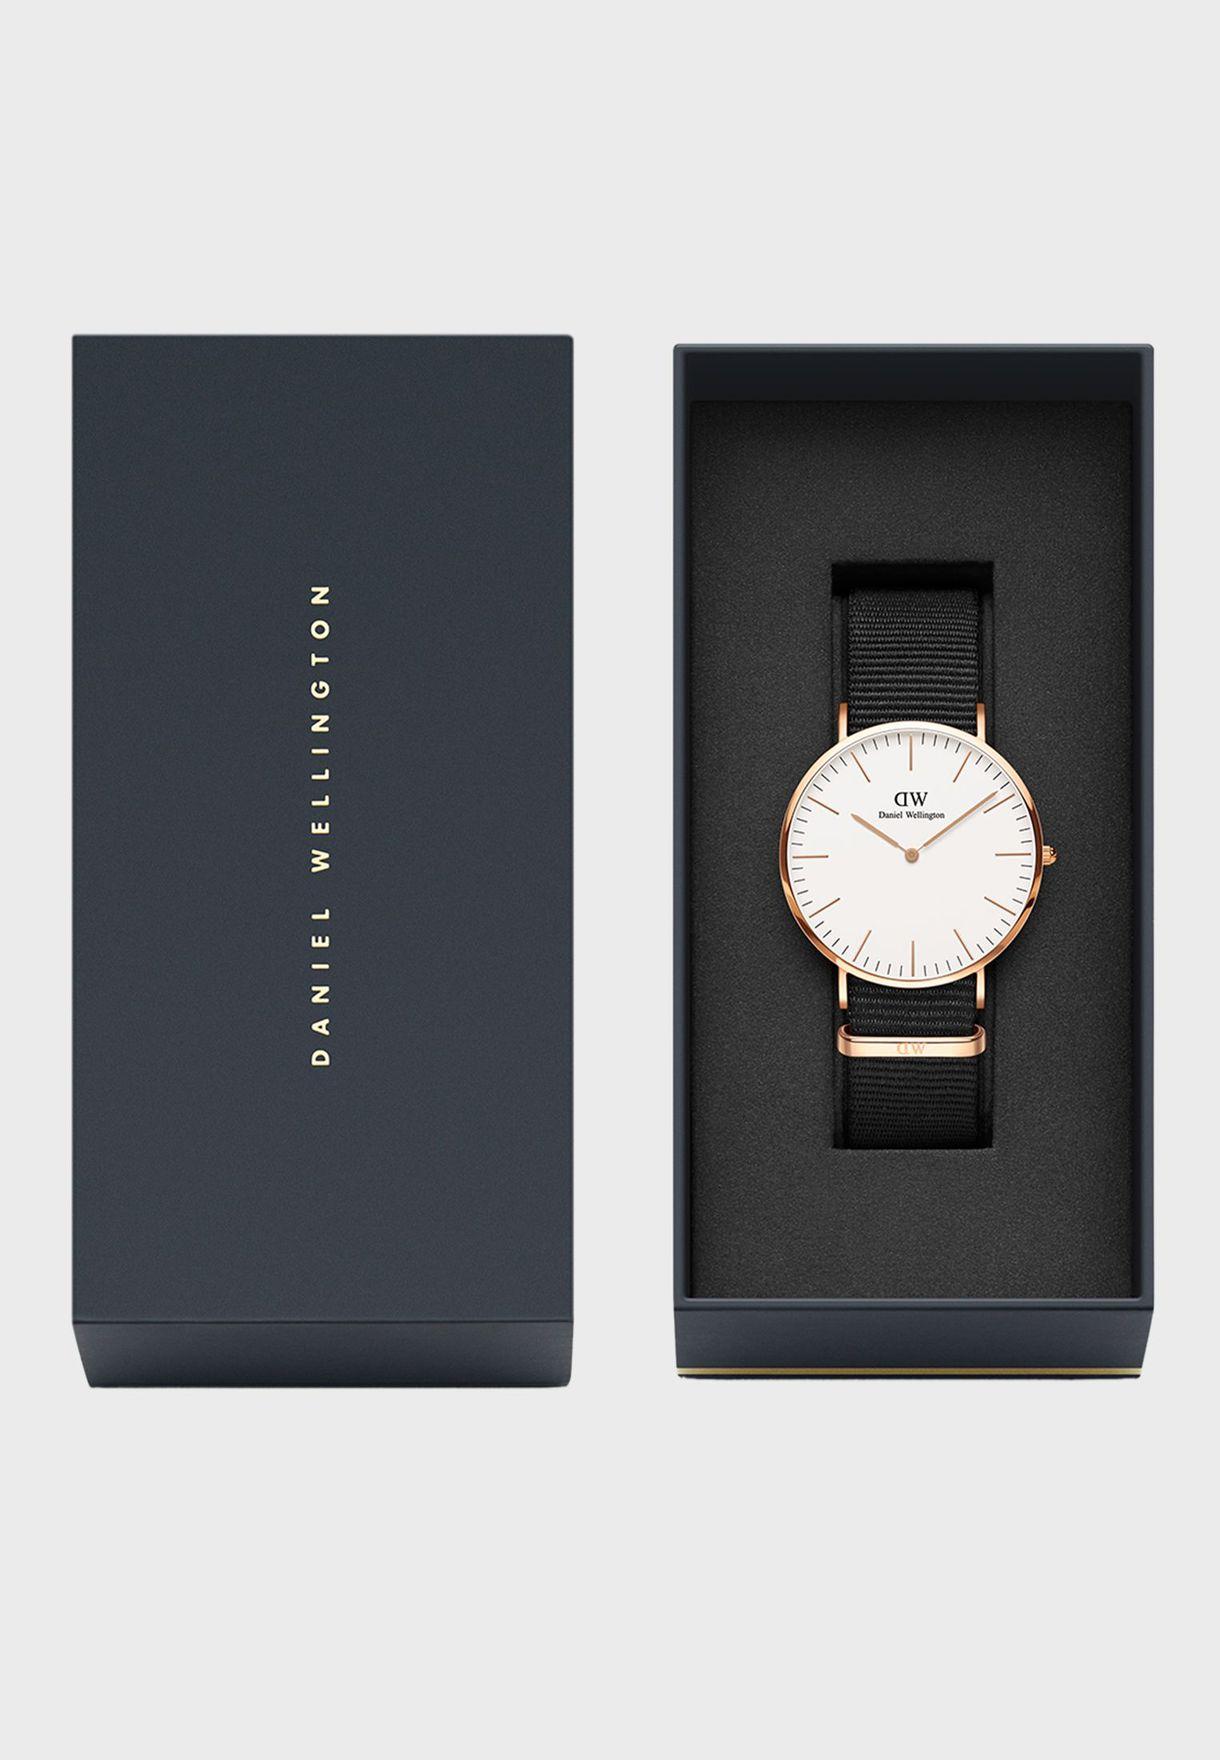 Petite Cornwall RG White 28mm Watch DW00100251